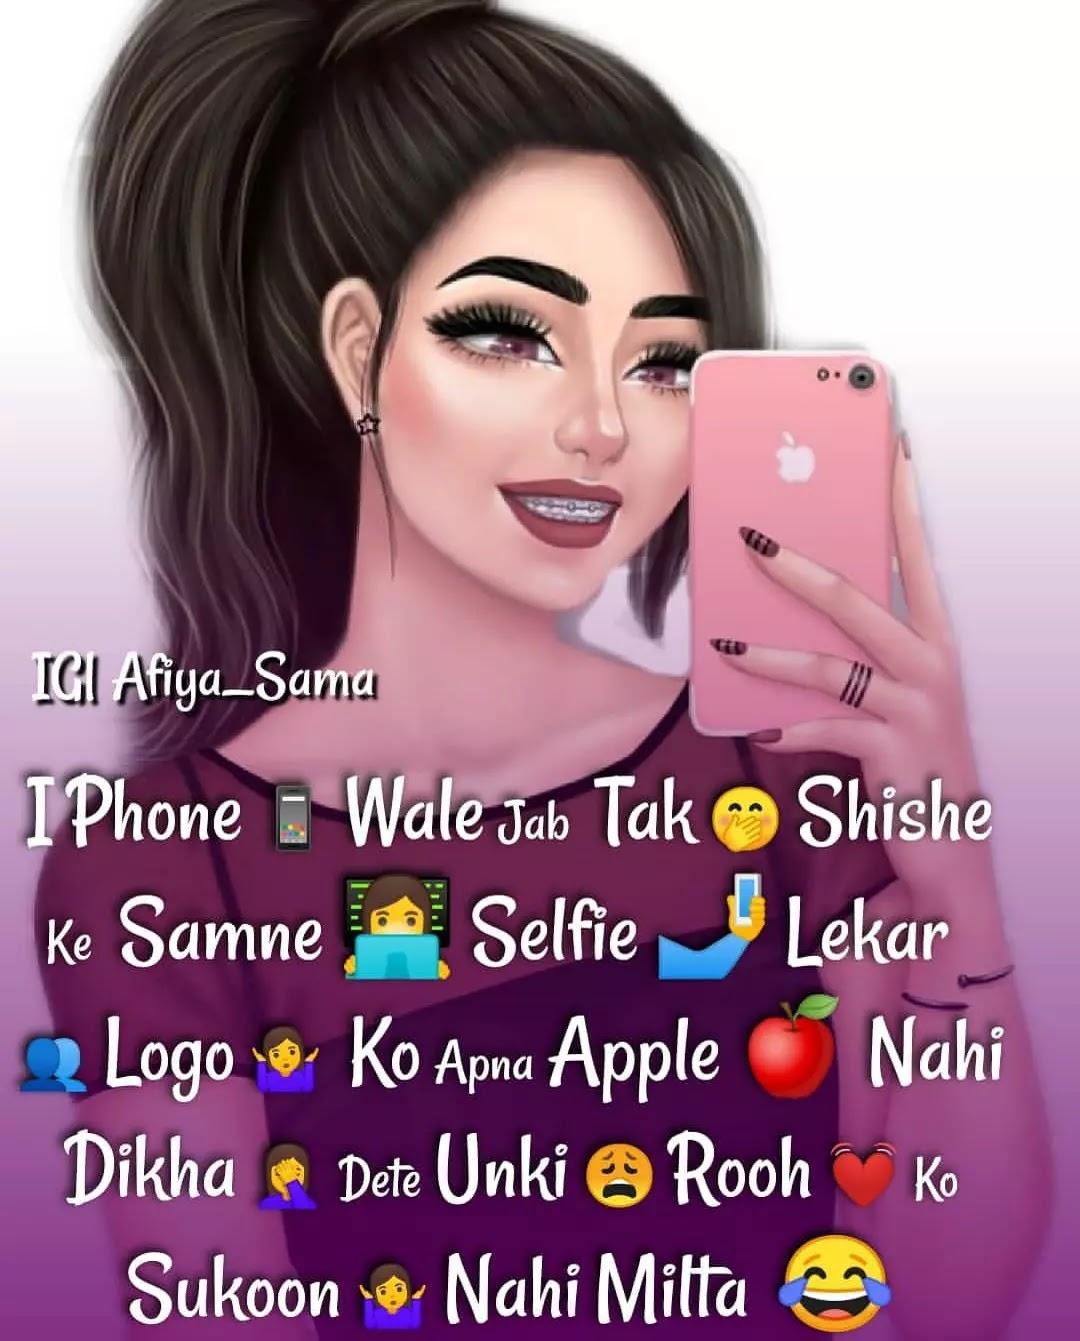 Girls instagram images, instagram dp girls images, girly instagram bio , girly instagram images, girl instagram status